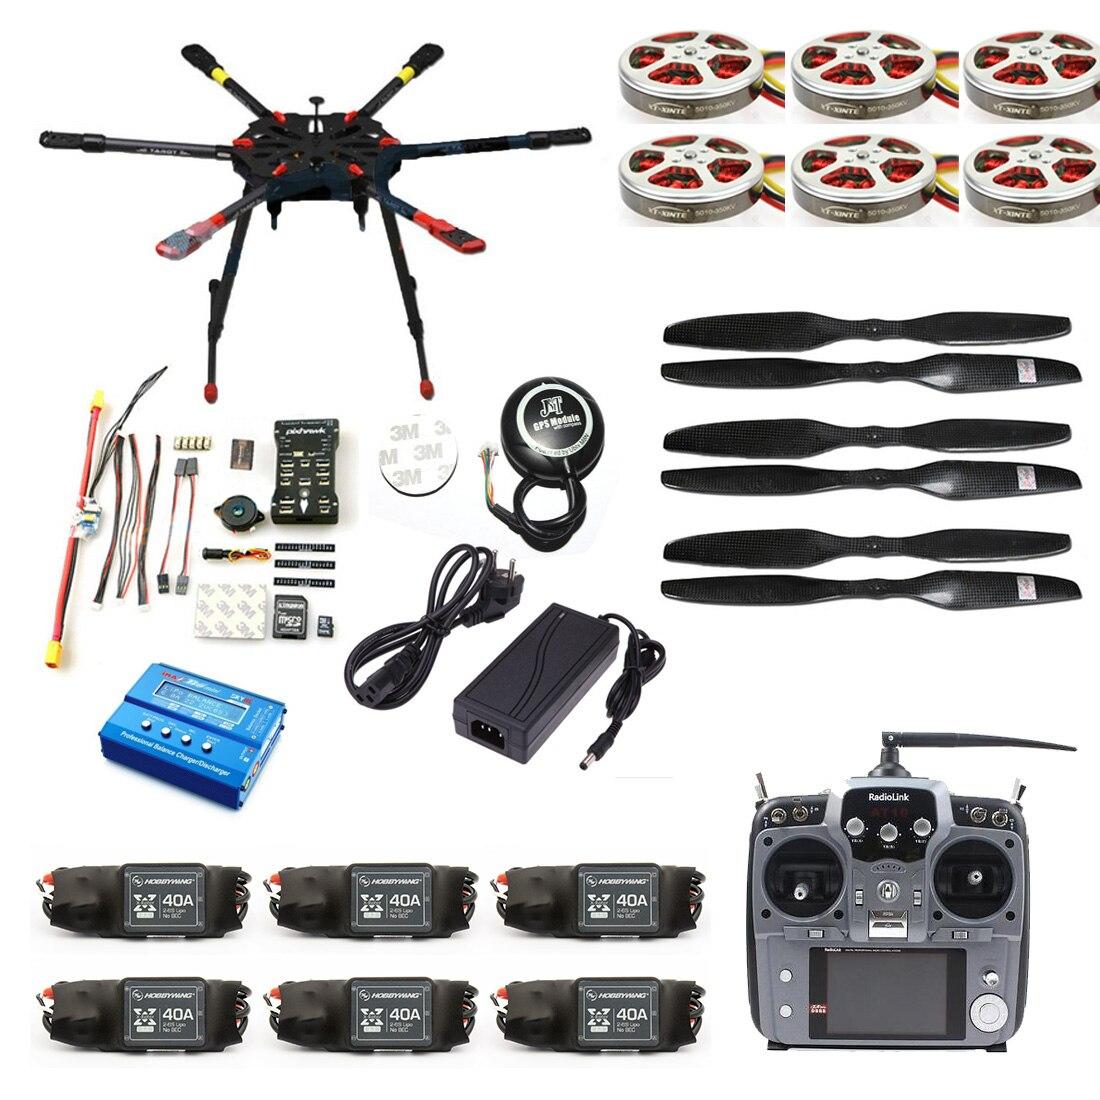 JMT Pro 2.4G 10CH 960mm Tarot X6 Folding Retractable PIX PX4 M8N GPS ARF/PNF DIY RC Hexacopter Drone Unassembly Kit F11283-A/B